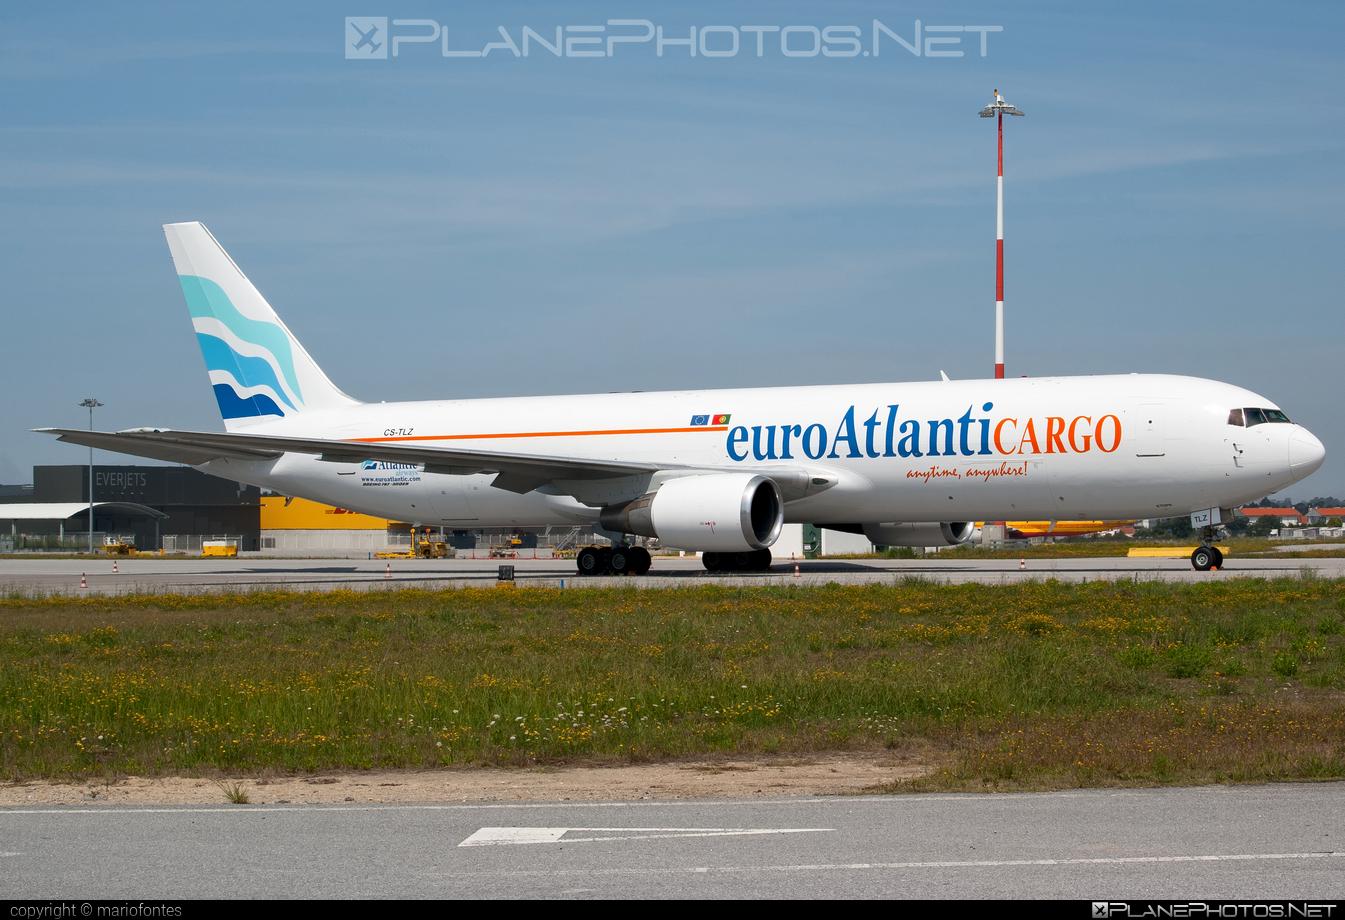 Boeing 767-300BDSF - CS-TLZ operated by EuroAtlantic Airways #b767 #b767300bdsf #b767bdsf #bedekspecialfreighter #boeing #boeing767 #euroatlantic #euroatlanticairways